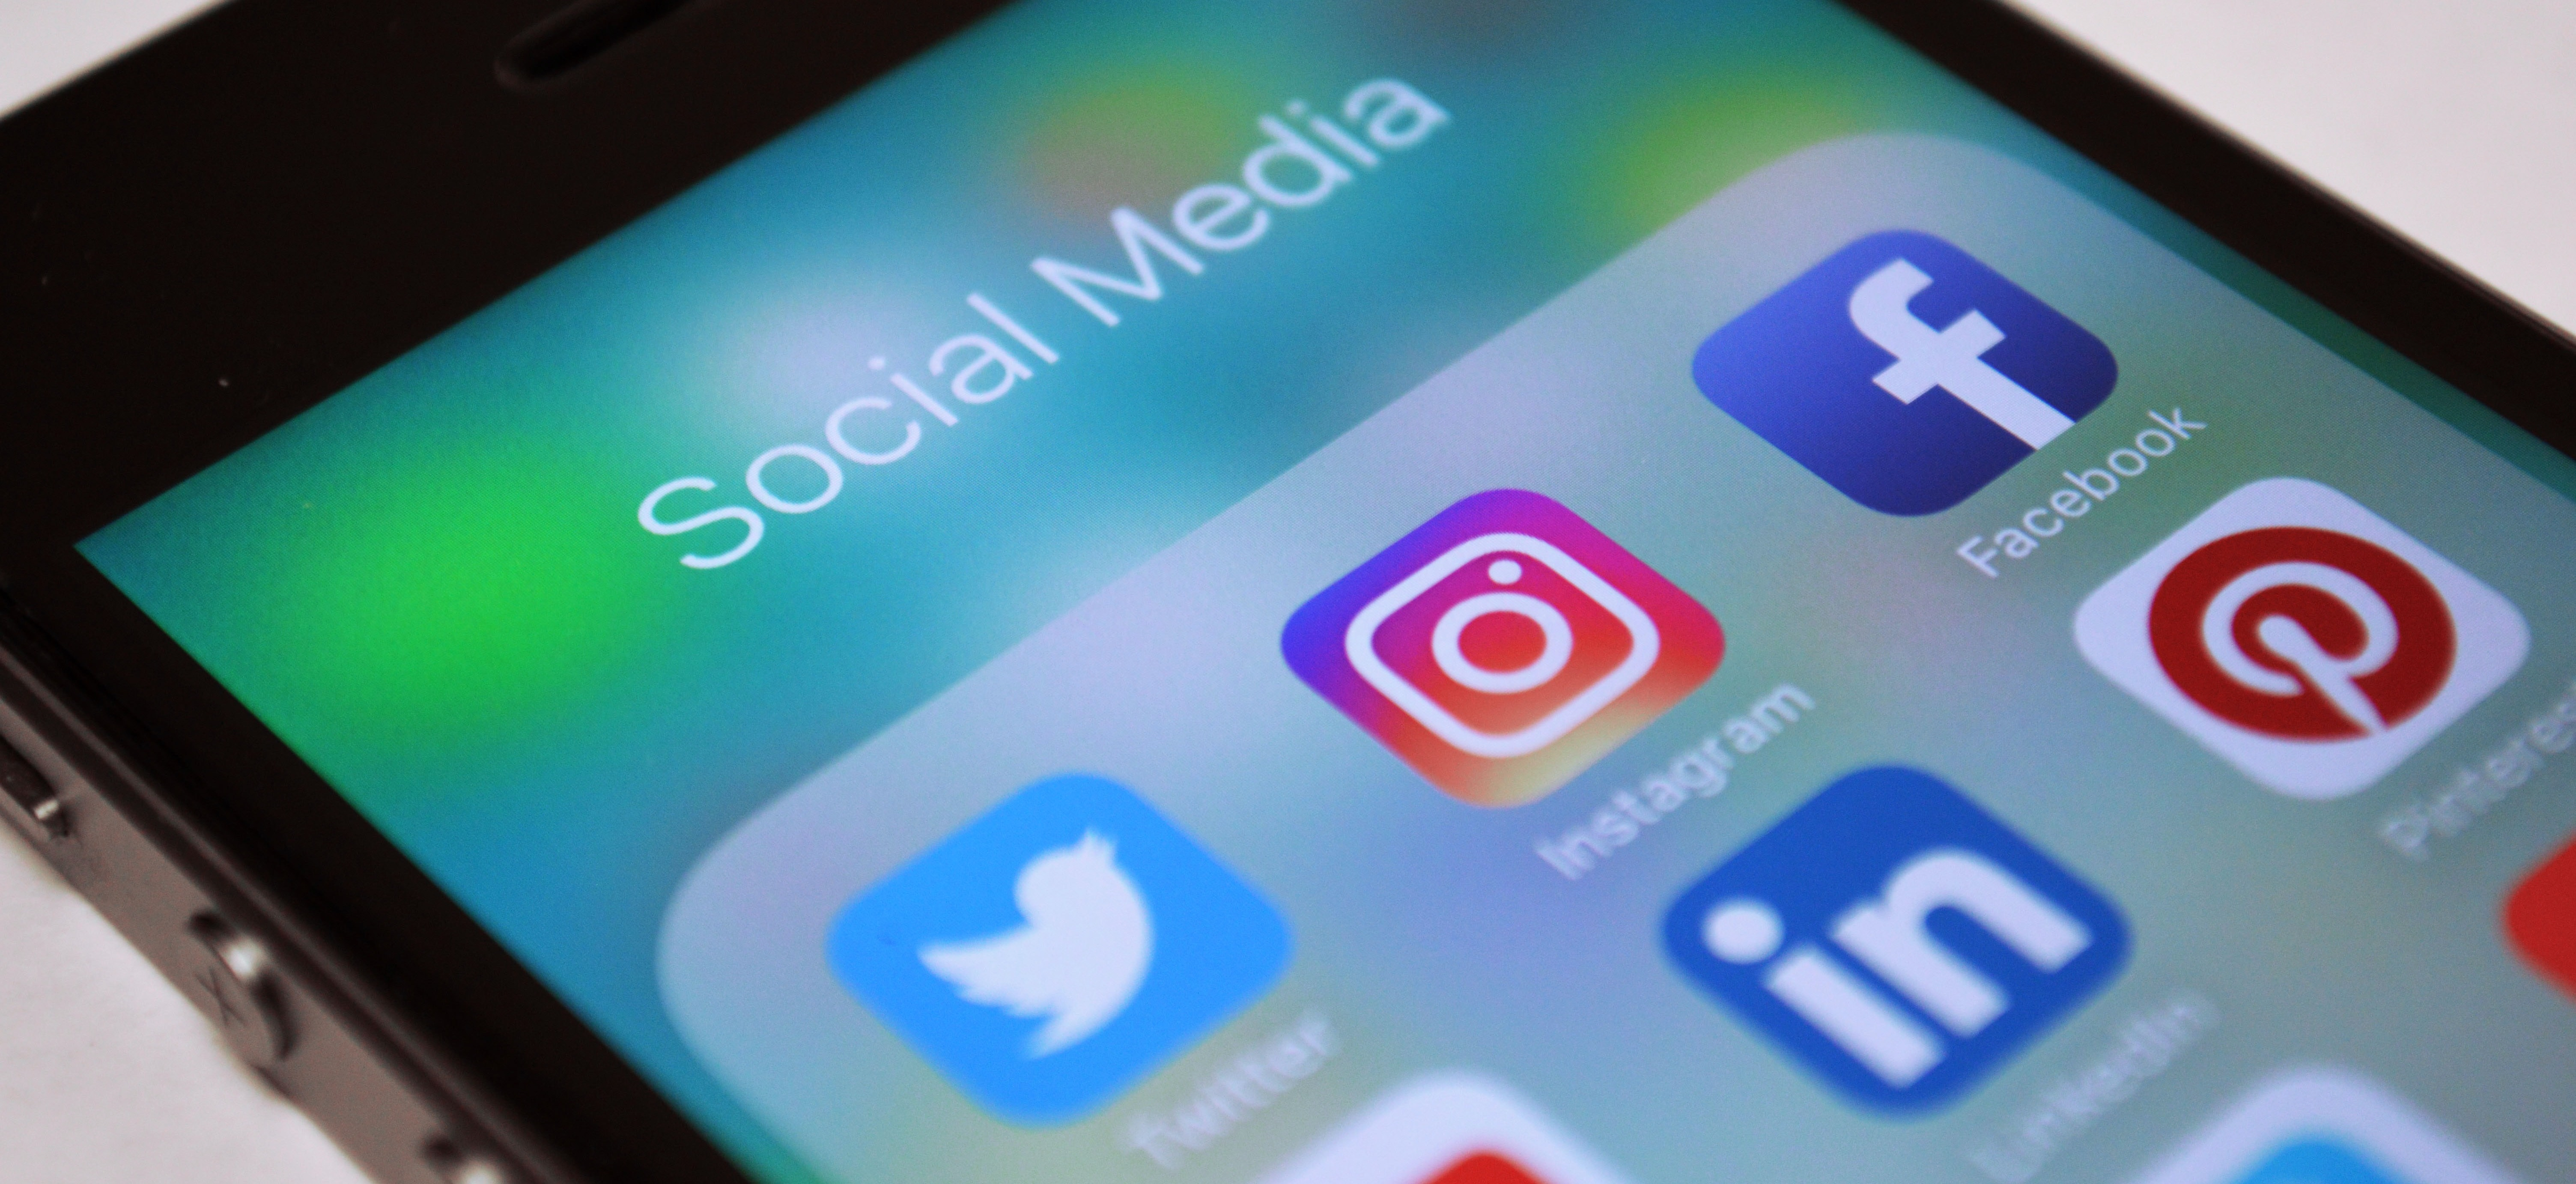 Social Media icons on mobile screen